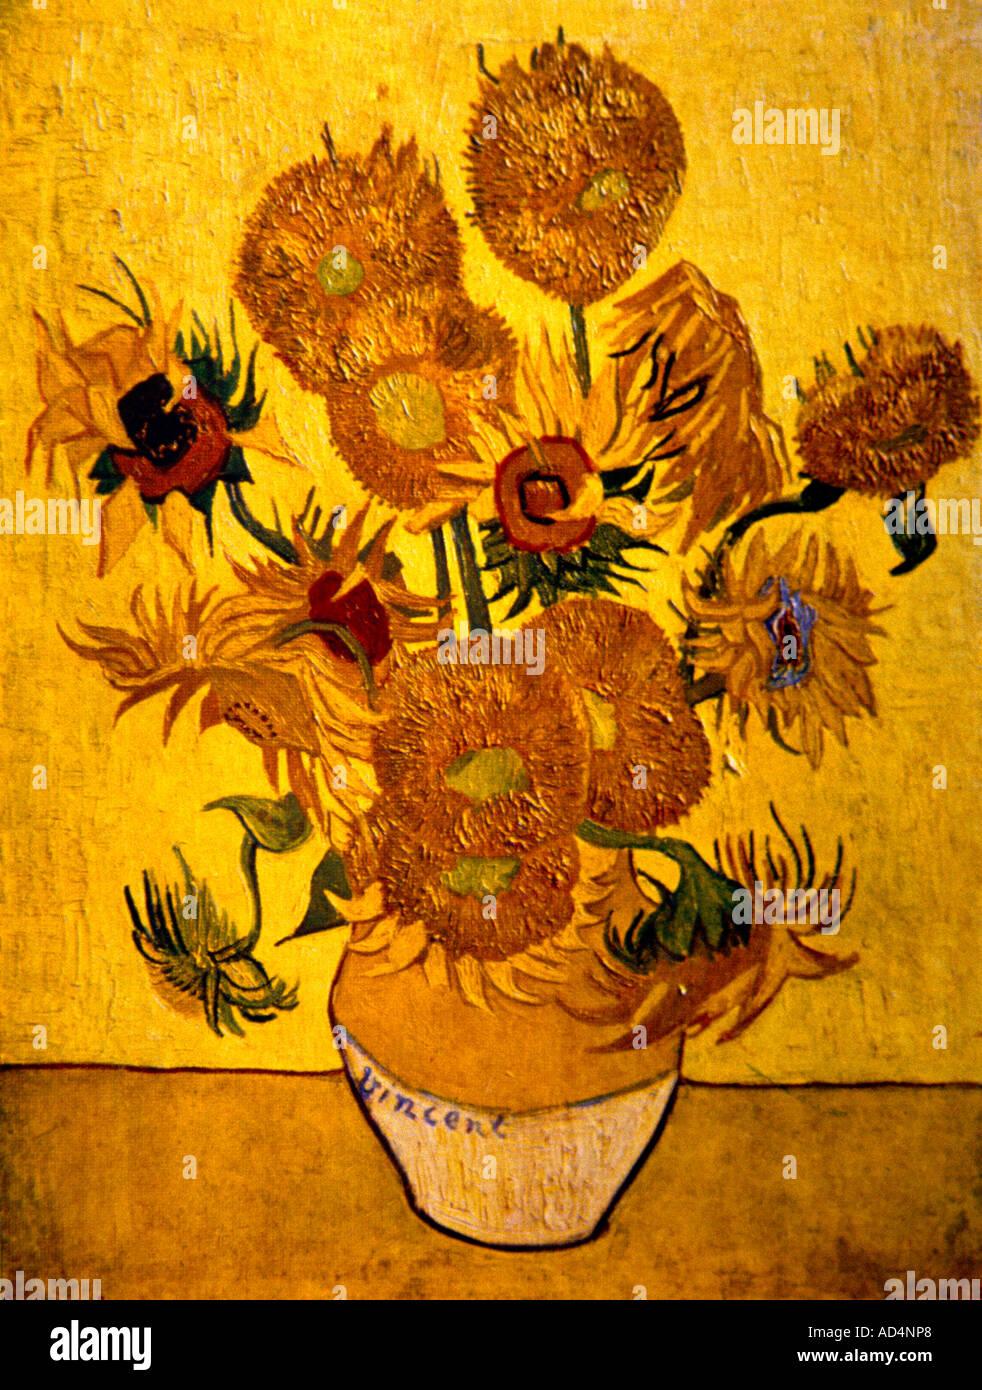 Van Gogh Sunflowers Stock Photos Amp Van Gogh Sunflowers Stock Images Alamy